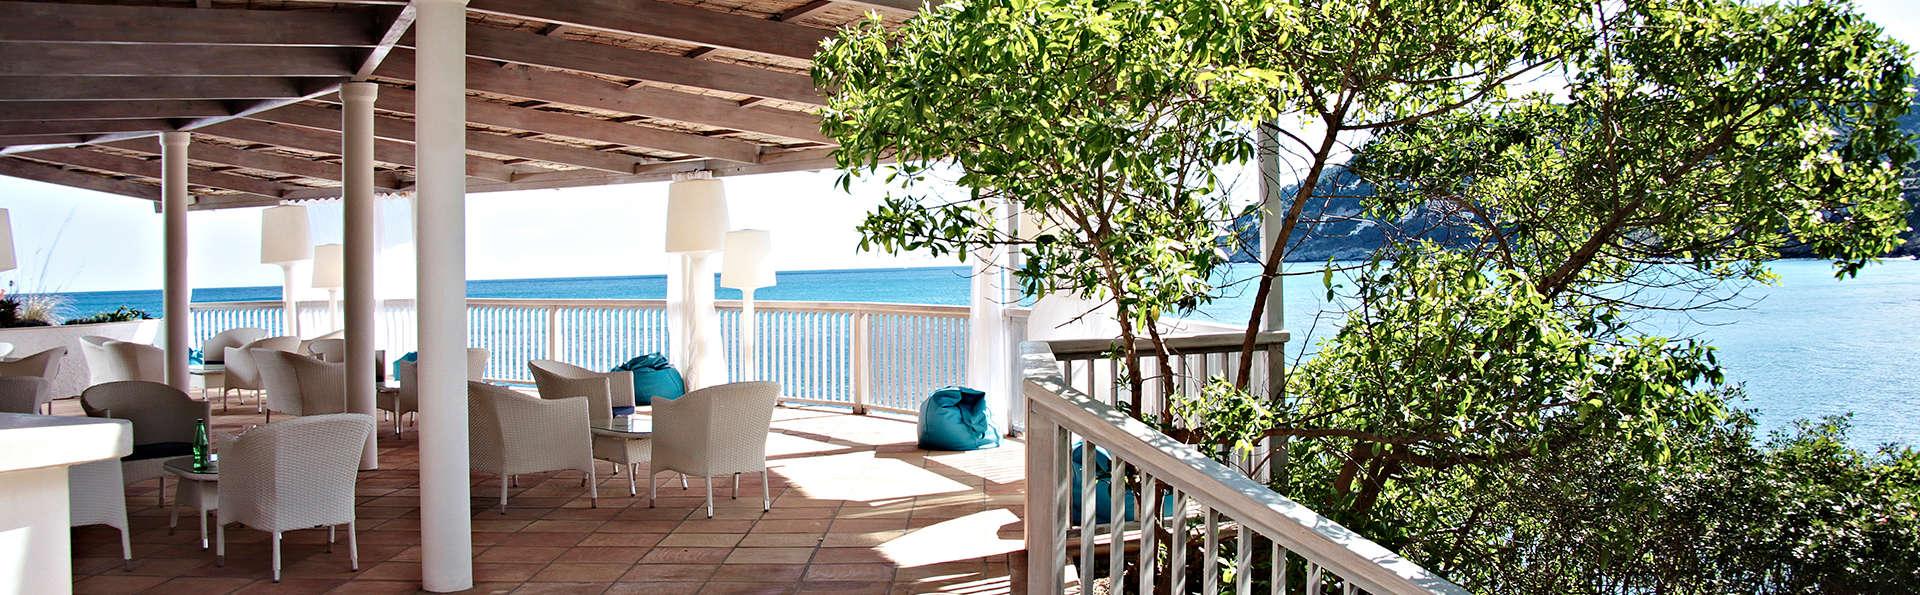 Cap Vermell Beach Hotel - Edit_Terrace4.jpg